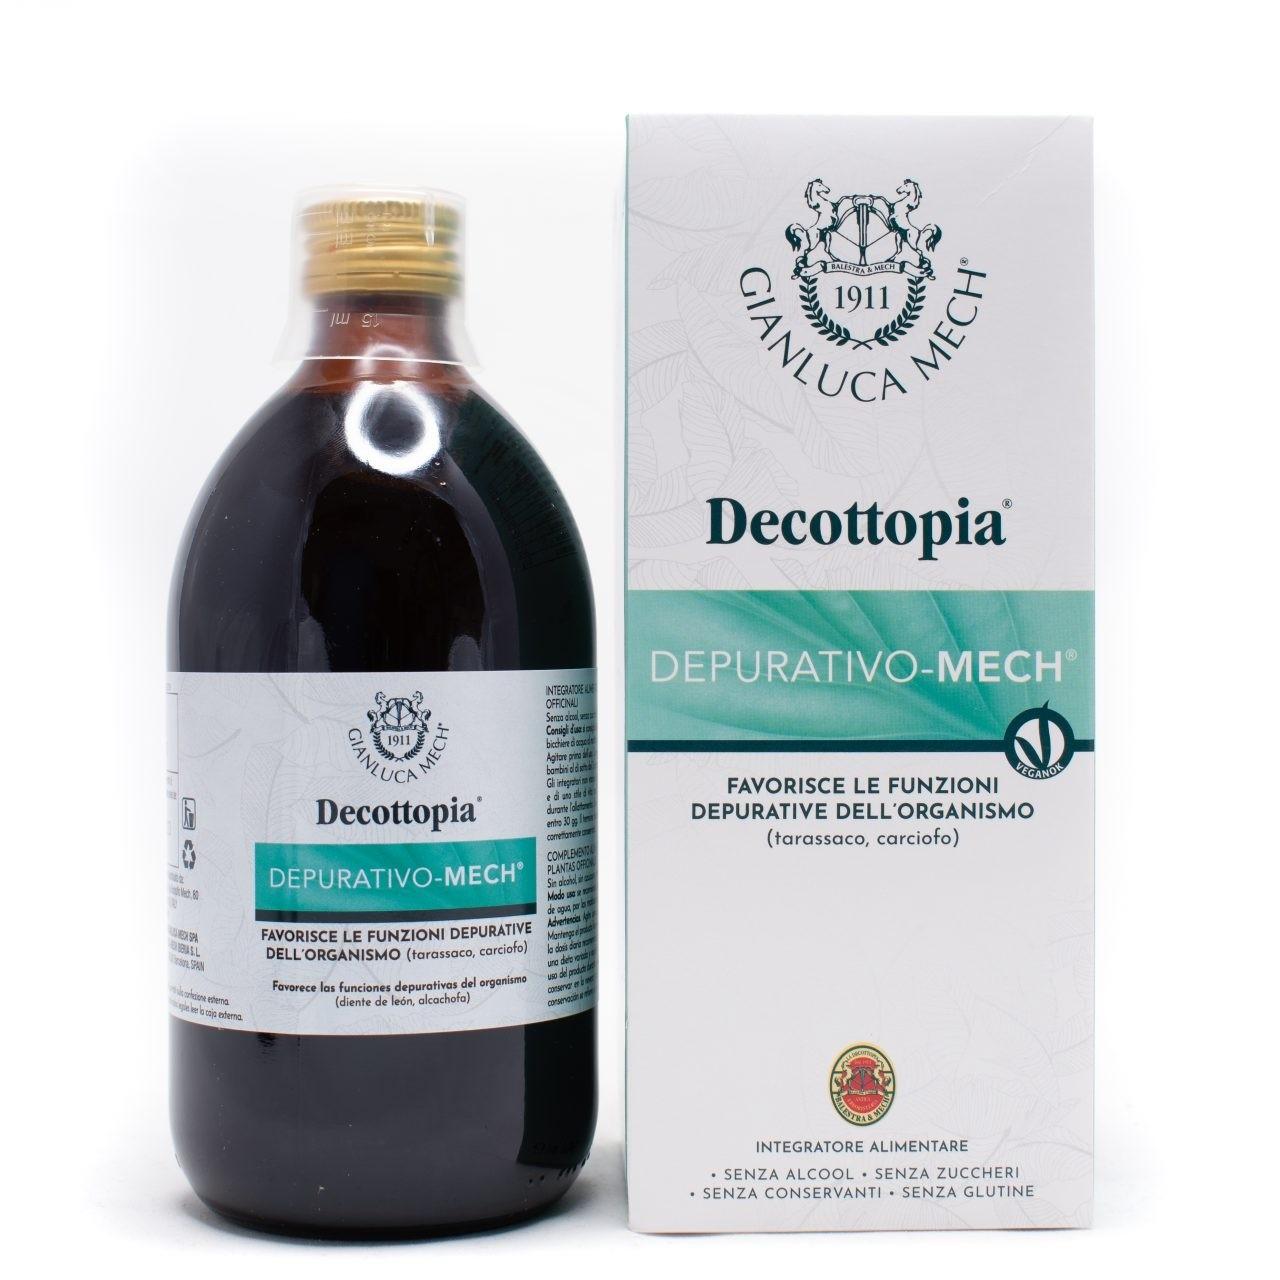 Gianluca Mech Decottopia Depurativo Mech 500ml